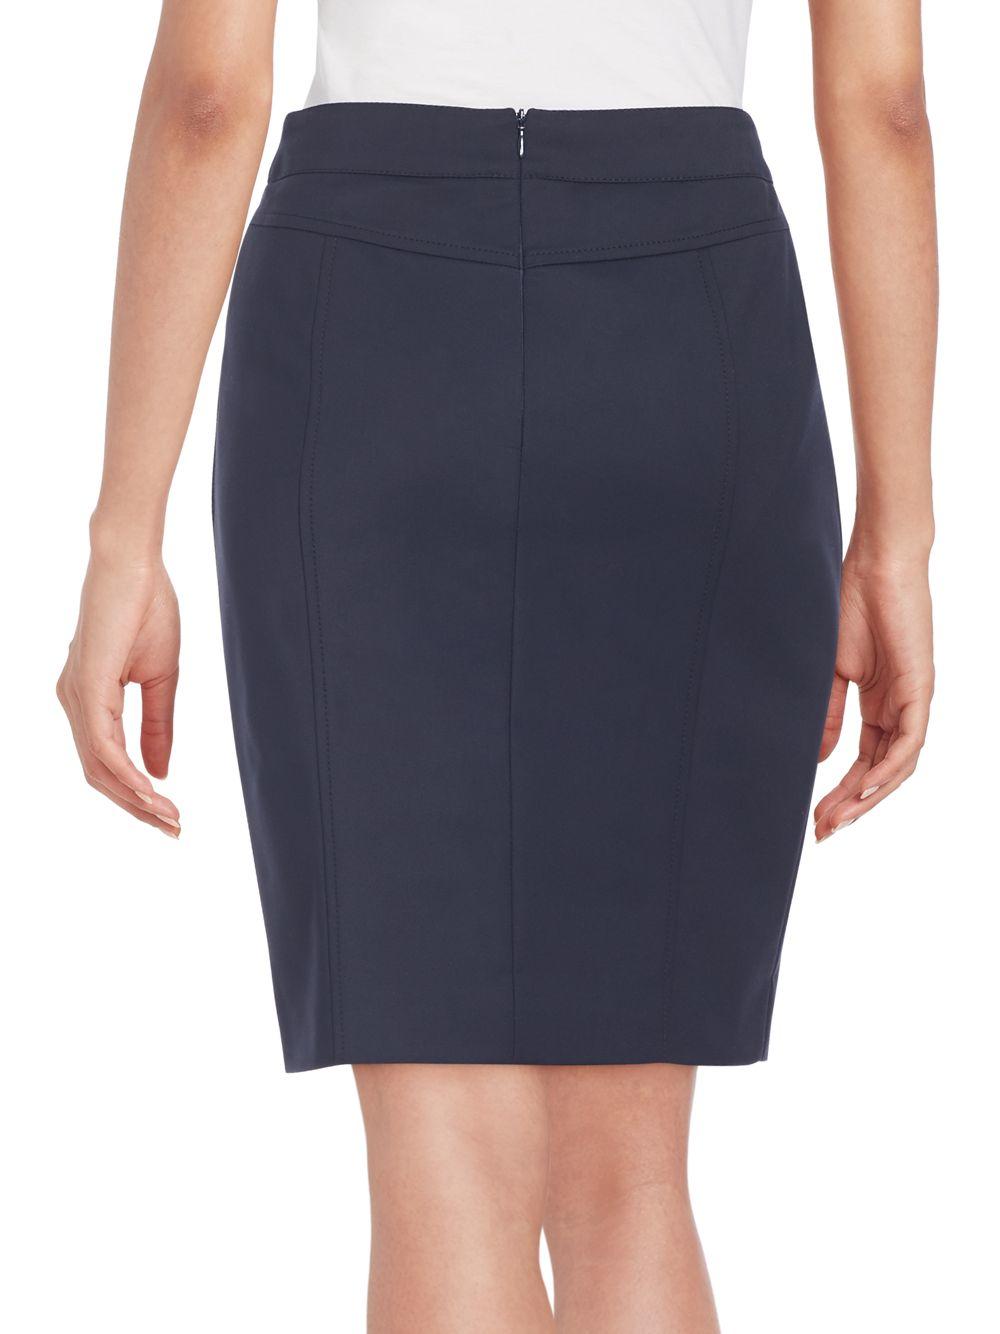 akris pocket detail pencil skirt in black lyst